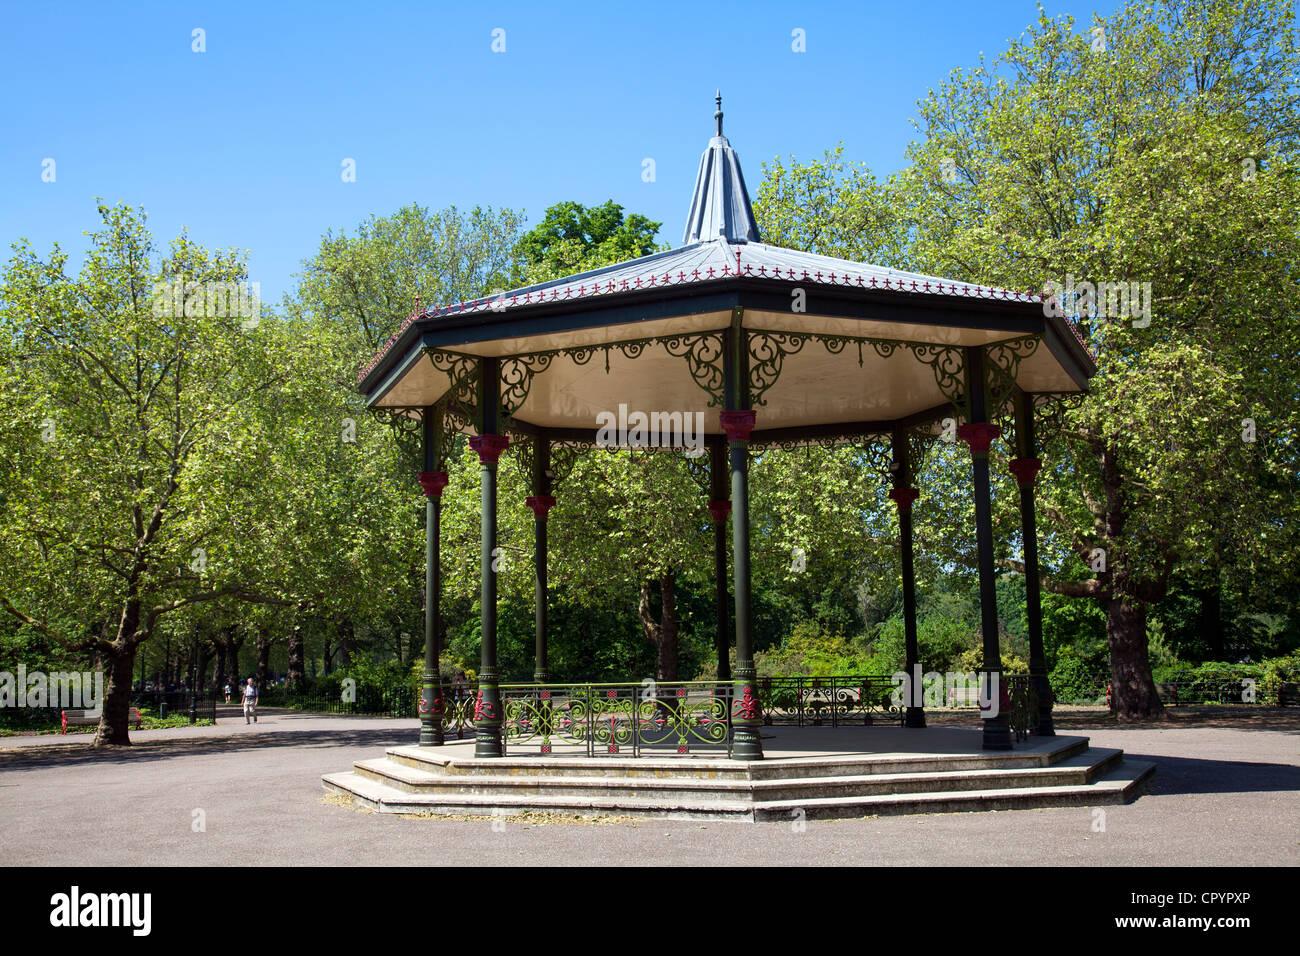 Battersea Park Bandstand - London UK - Stock Image